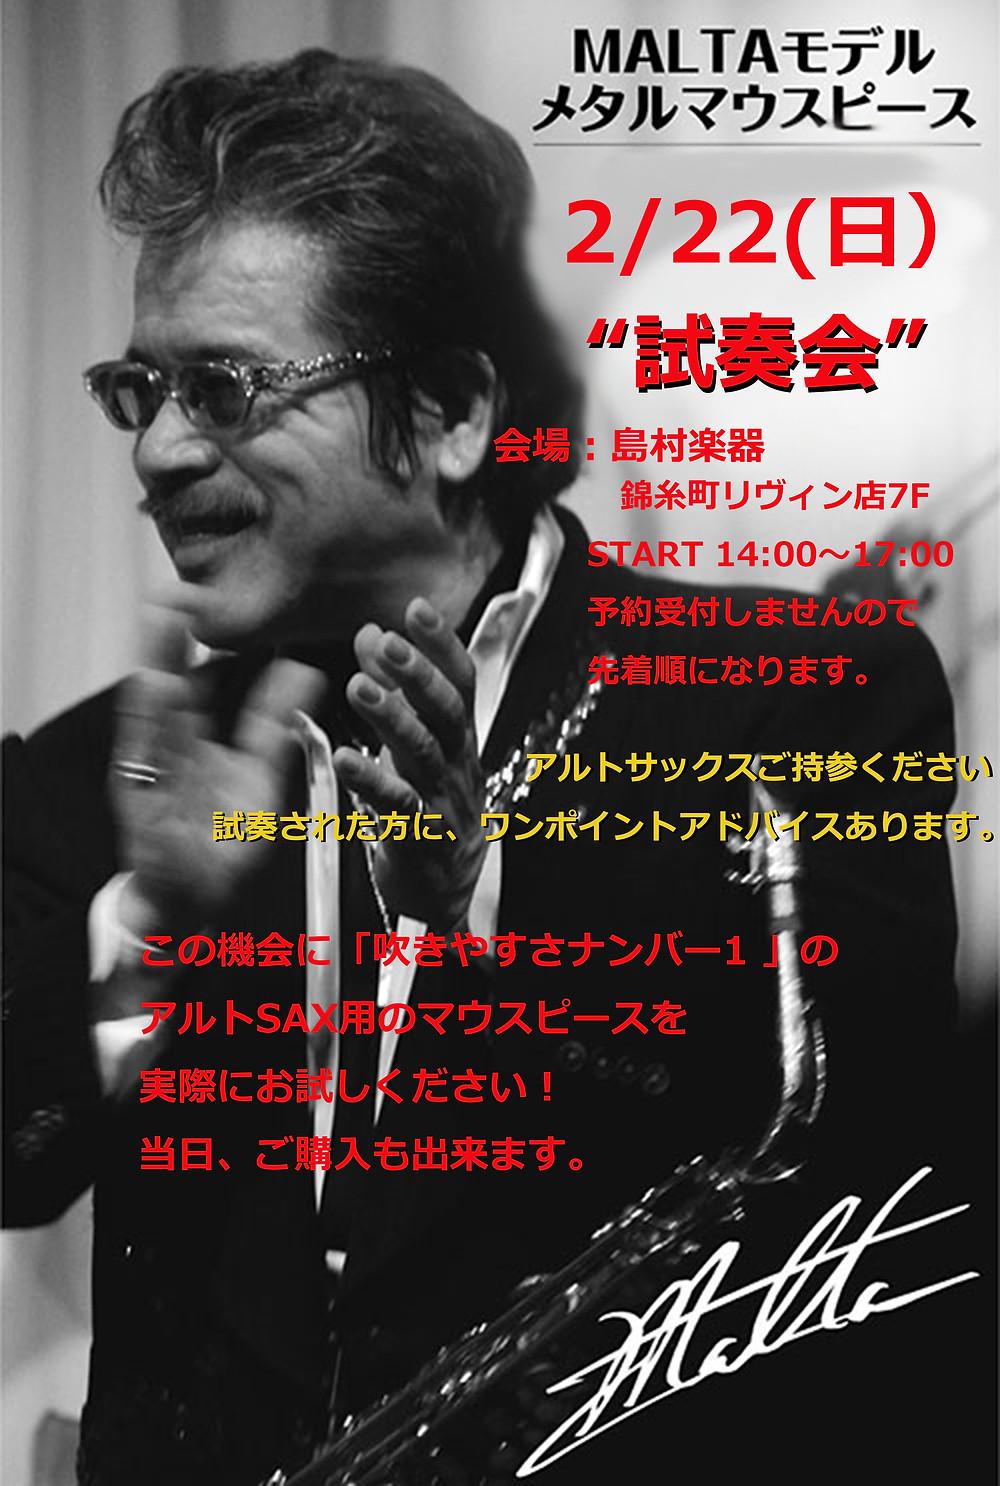 2月22日錦糸町マッピ試奏会用MALTA.jpg